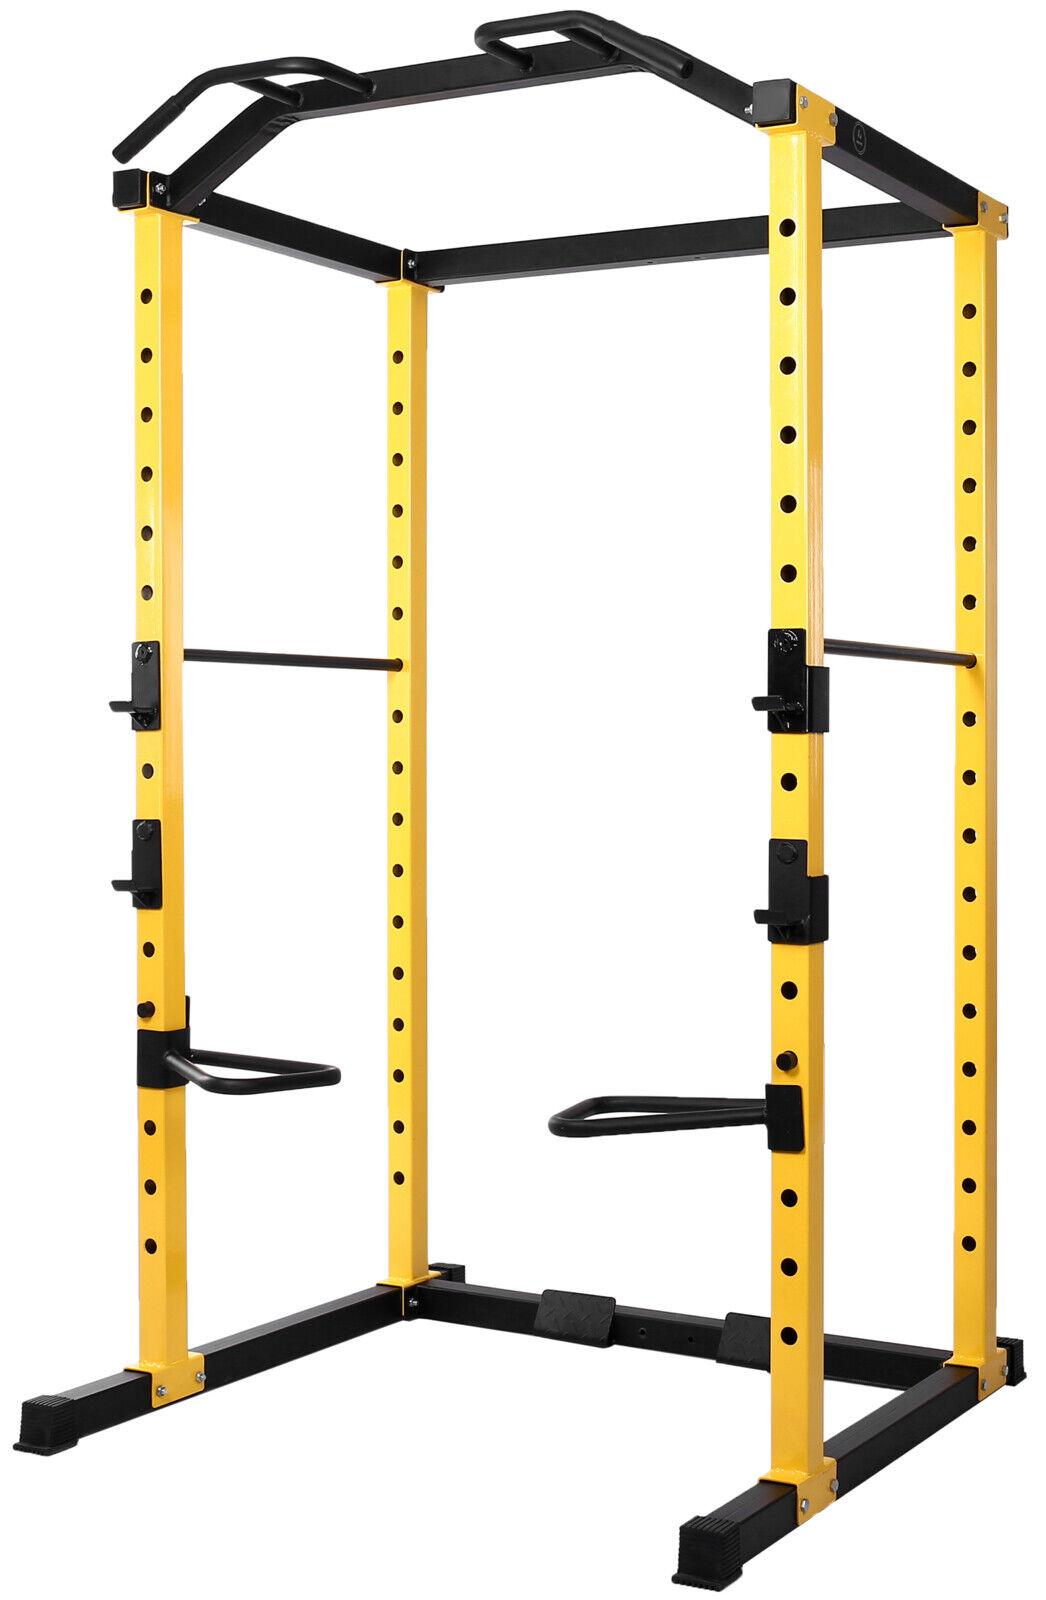 Power Cage Multi-Function Adjustable Squat Rack Home Gym Bod